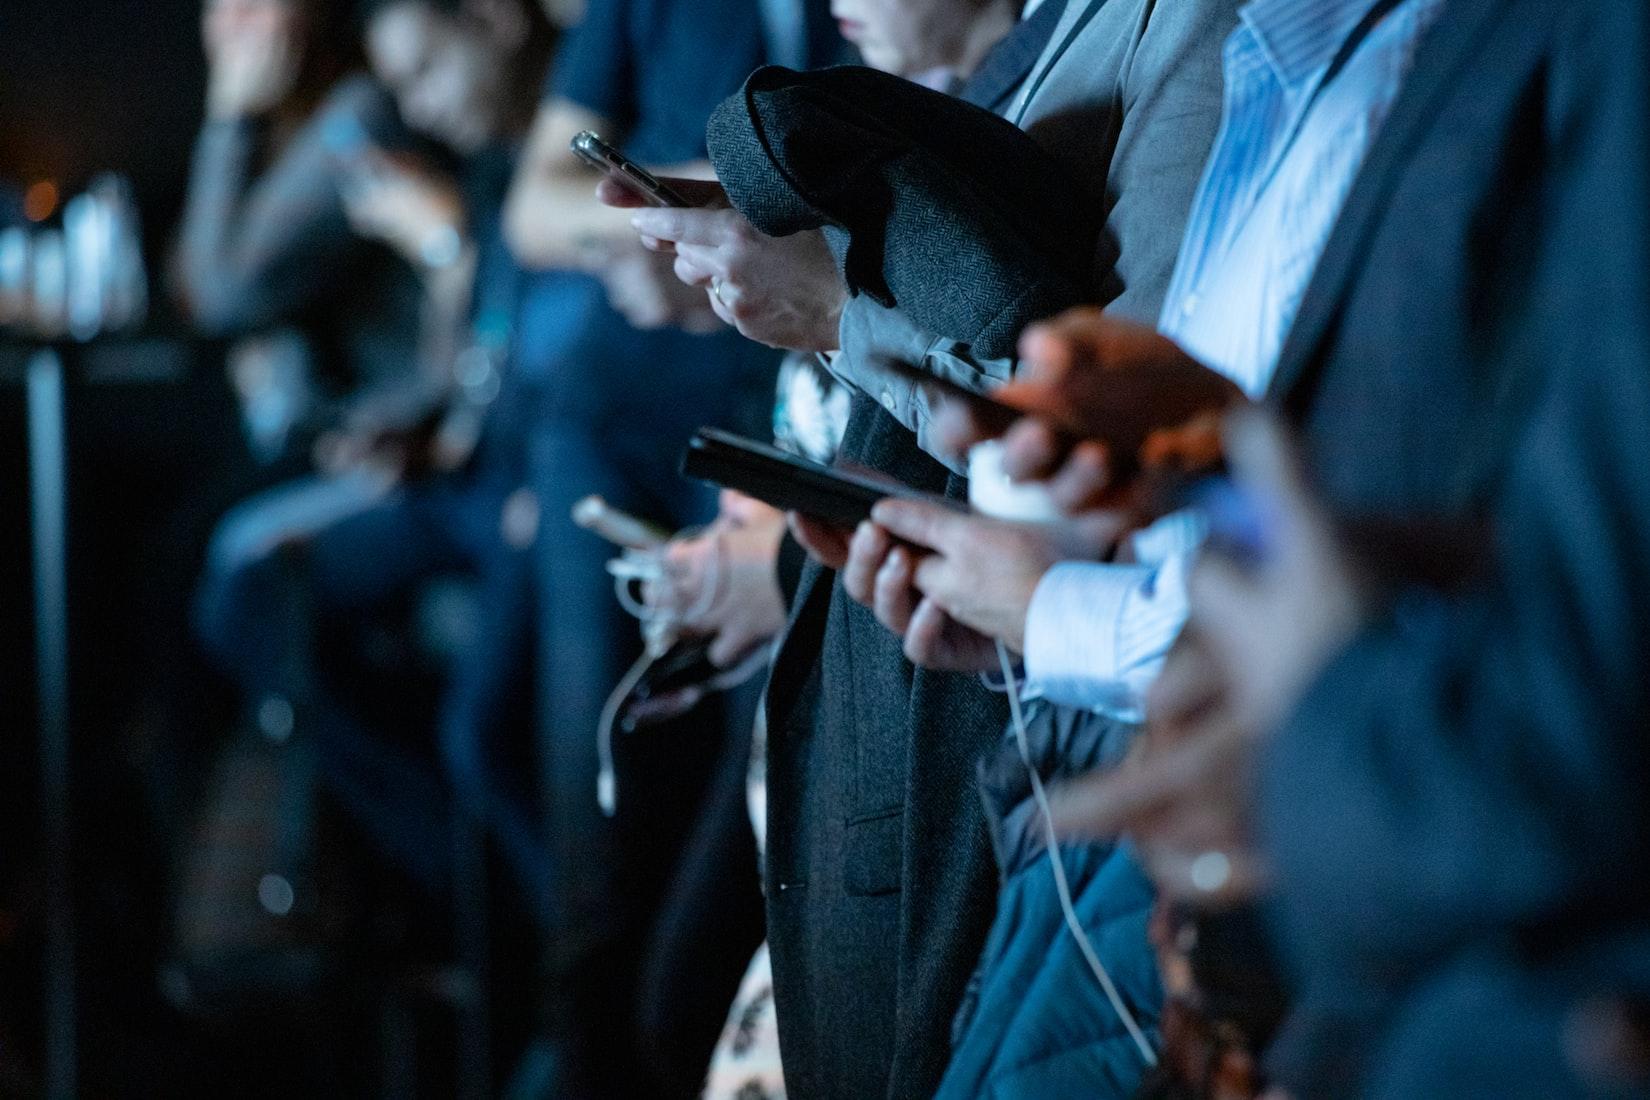 users on phone screens